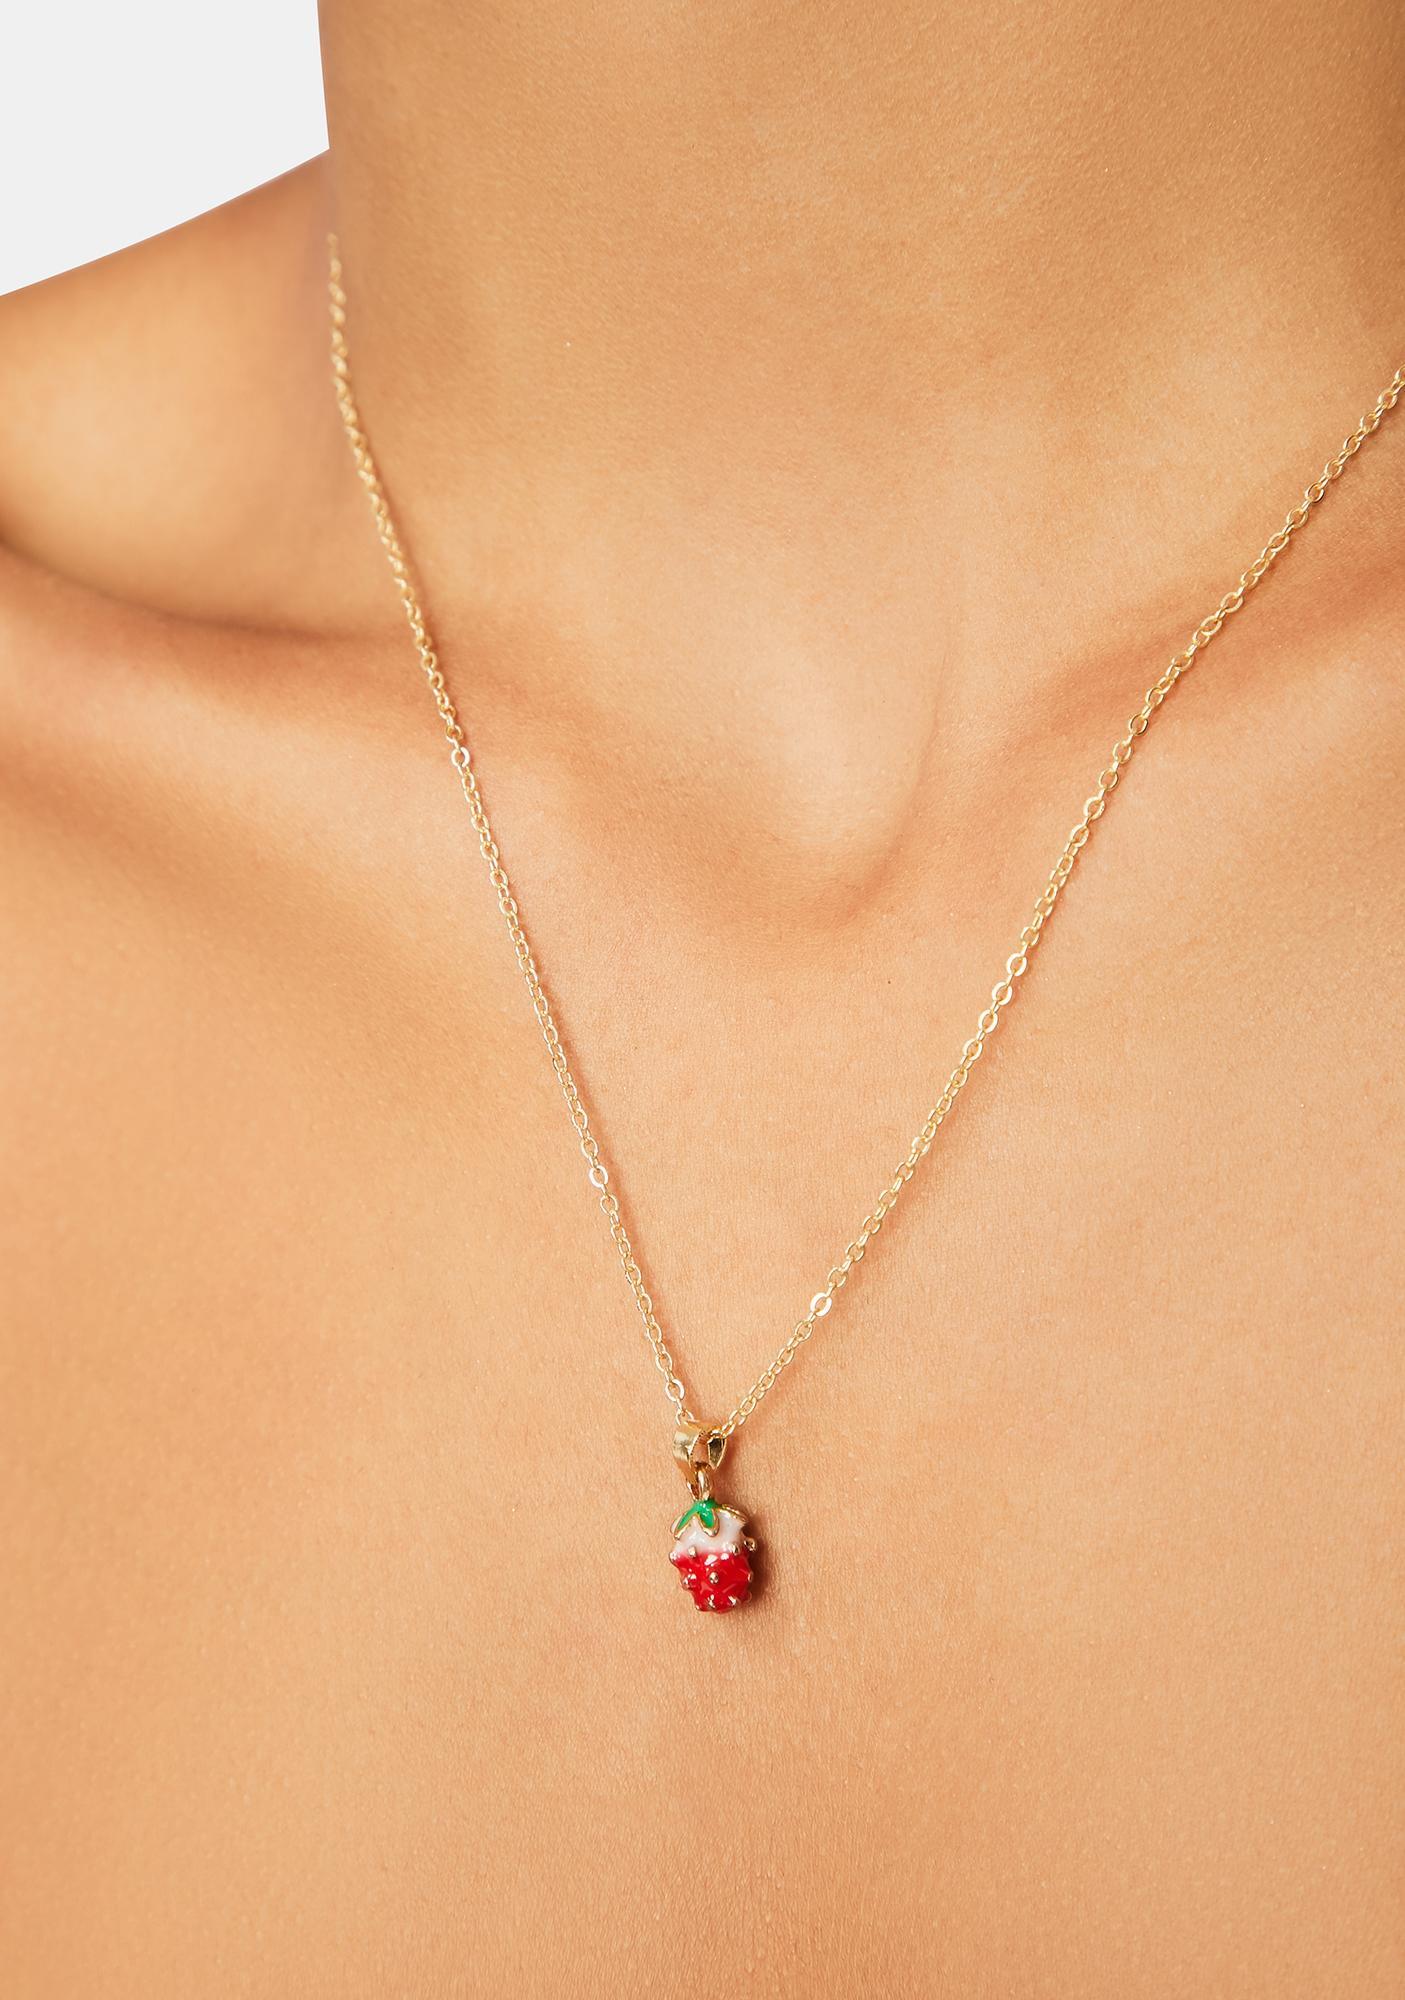 Sweetest Treat Strawberry Charm Necklace